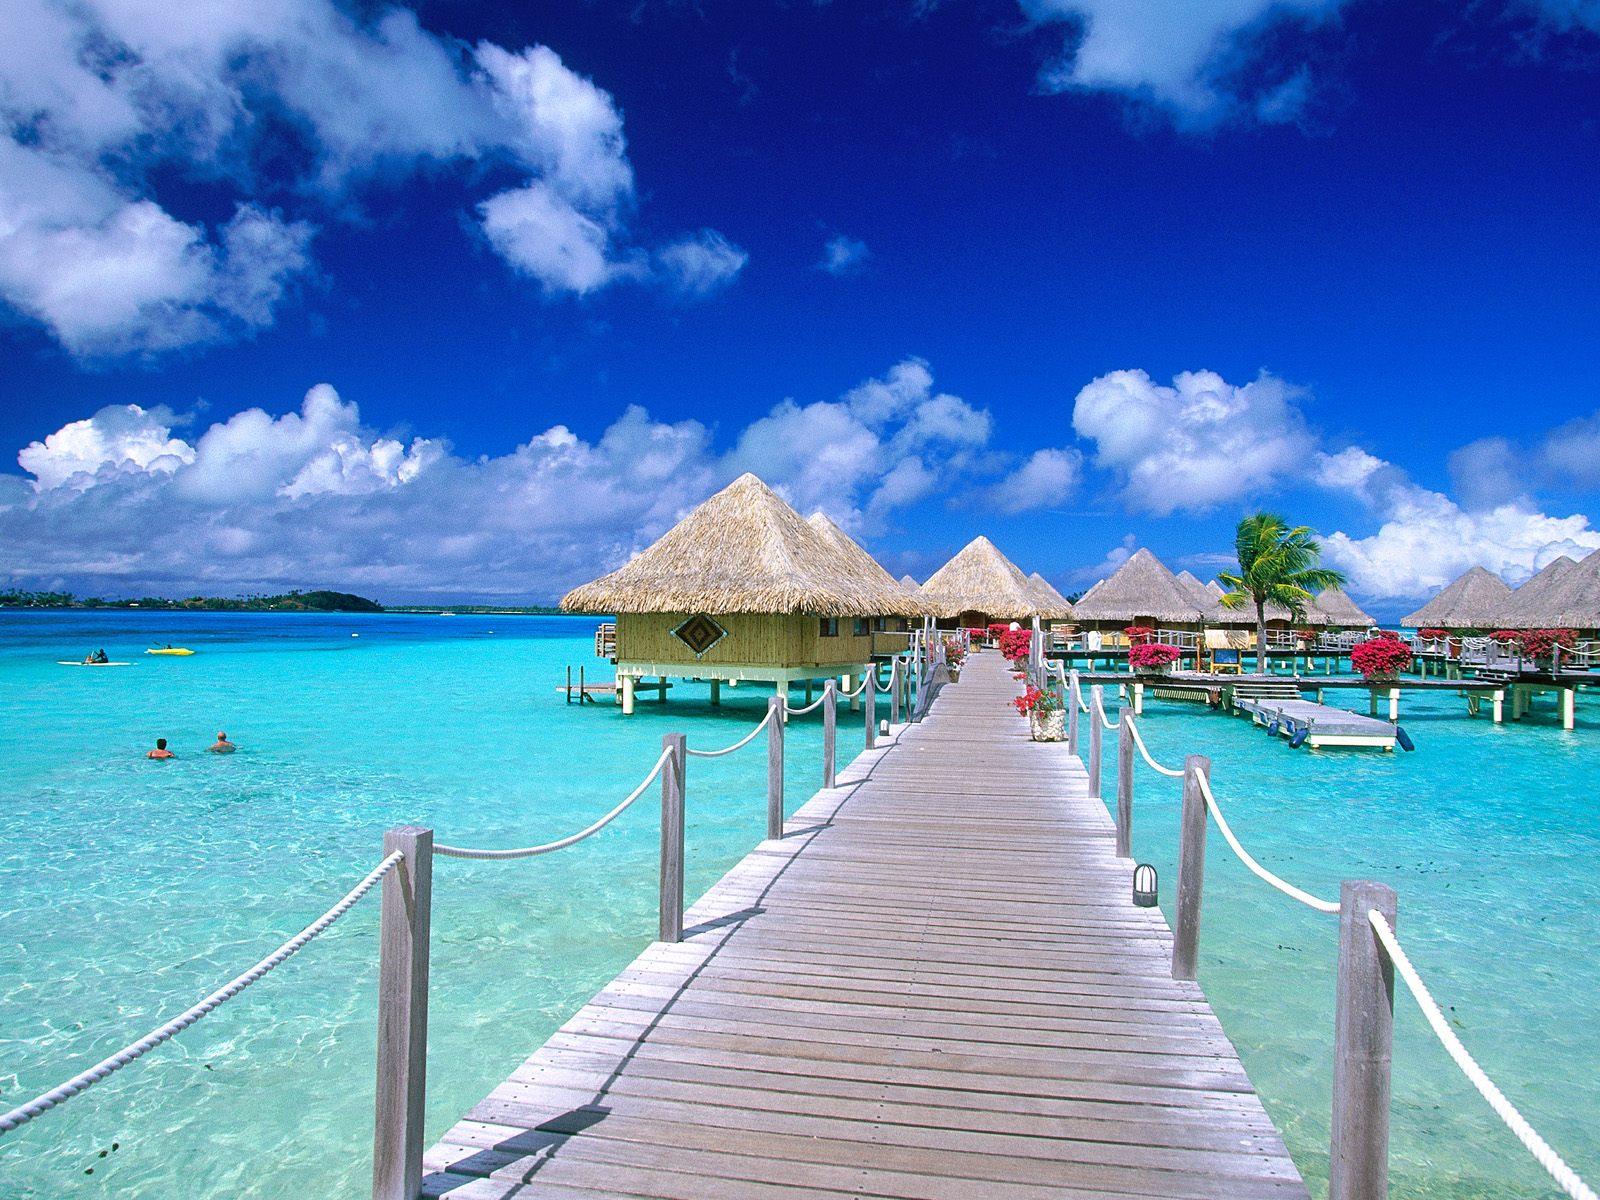 http://3.bp.blogspot.com/-AljoeMfZnbk/TZEDpnSlZlI/AAAAAAAAAFQ/9FUi-Jq9U1c/s1600/matira_point_bora_bora_french_polynesia.jpg